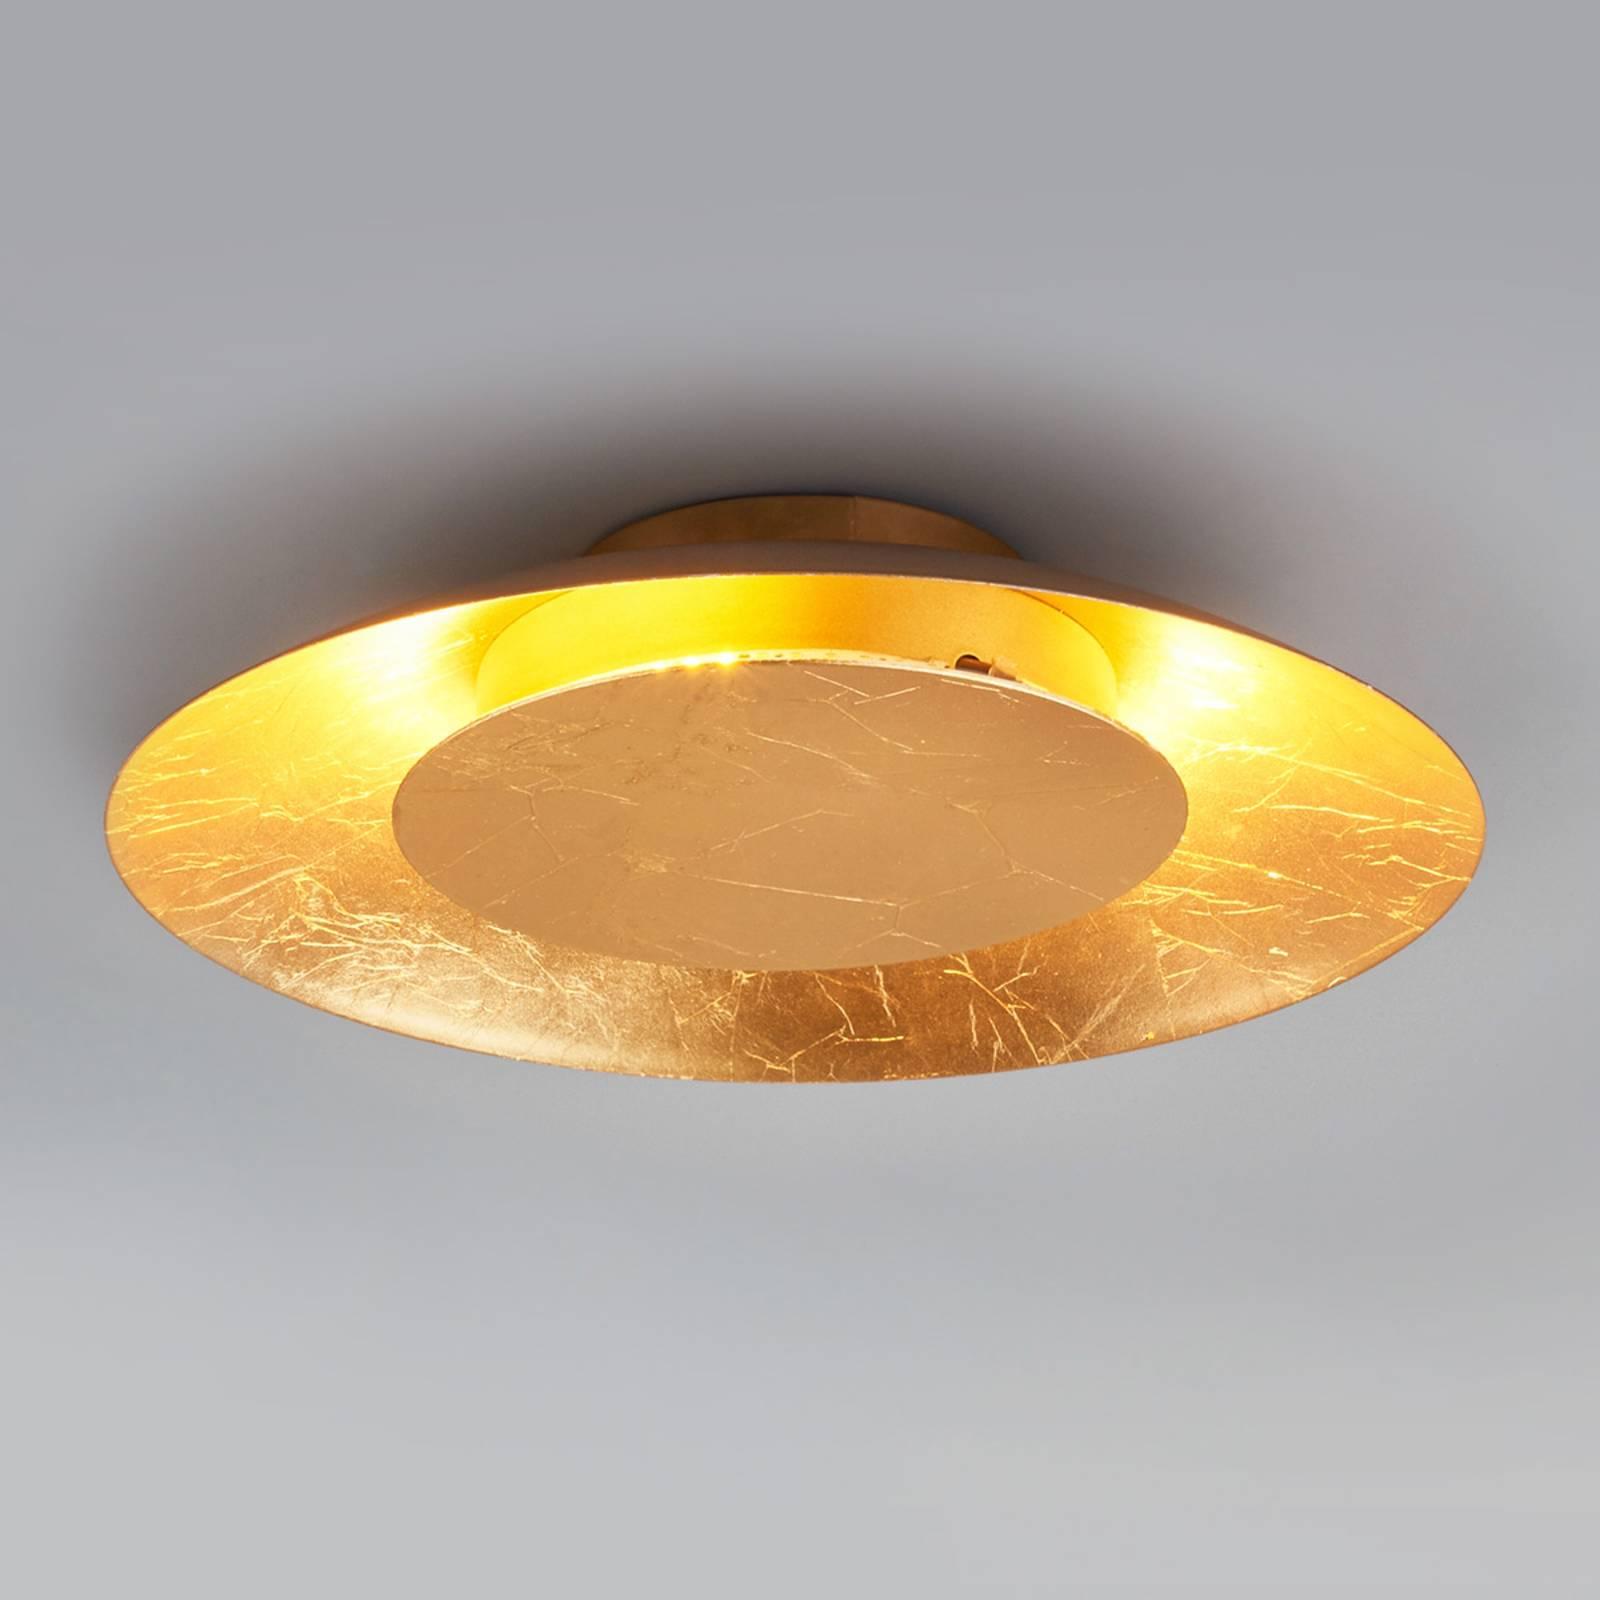 LED-kattolamppu Keti, kultaoptiikka, Ø 34,5 cm